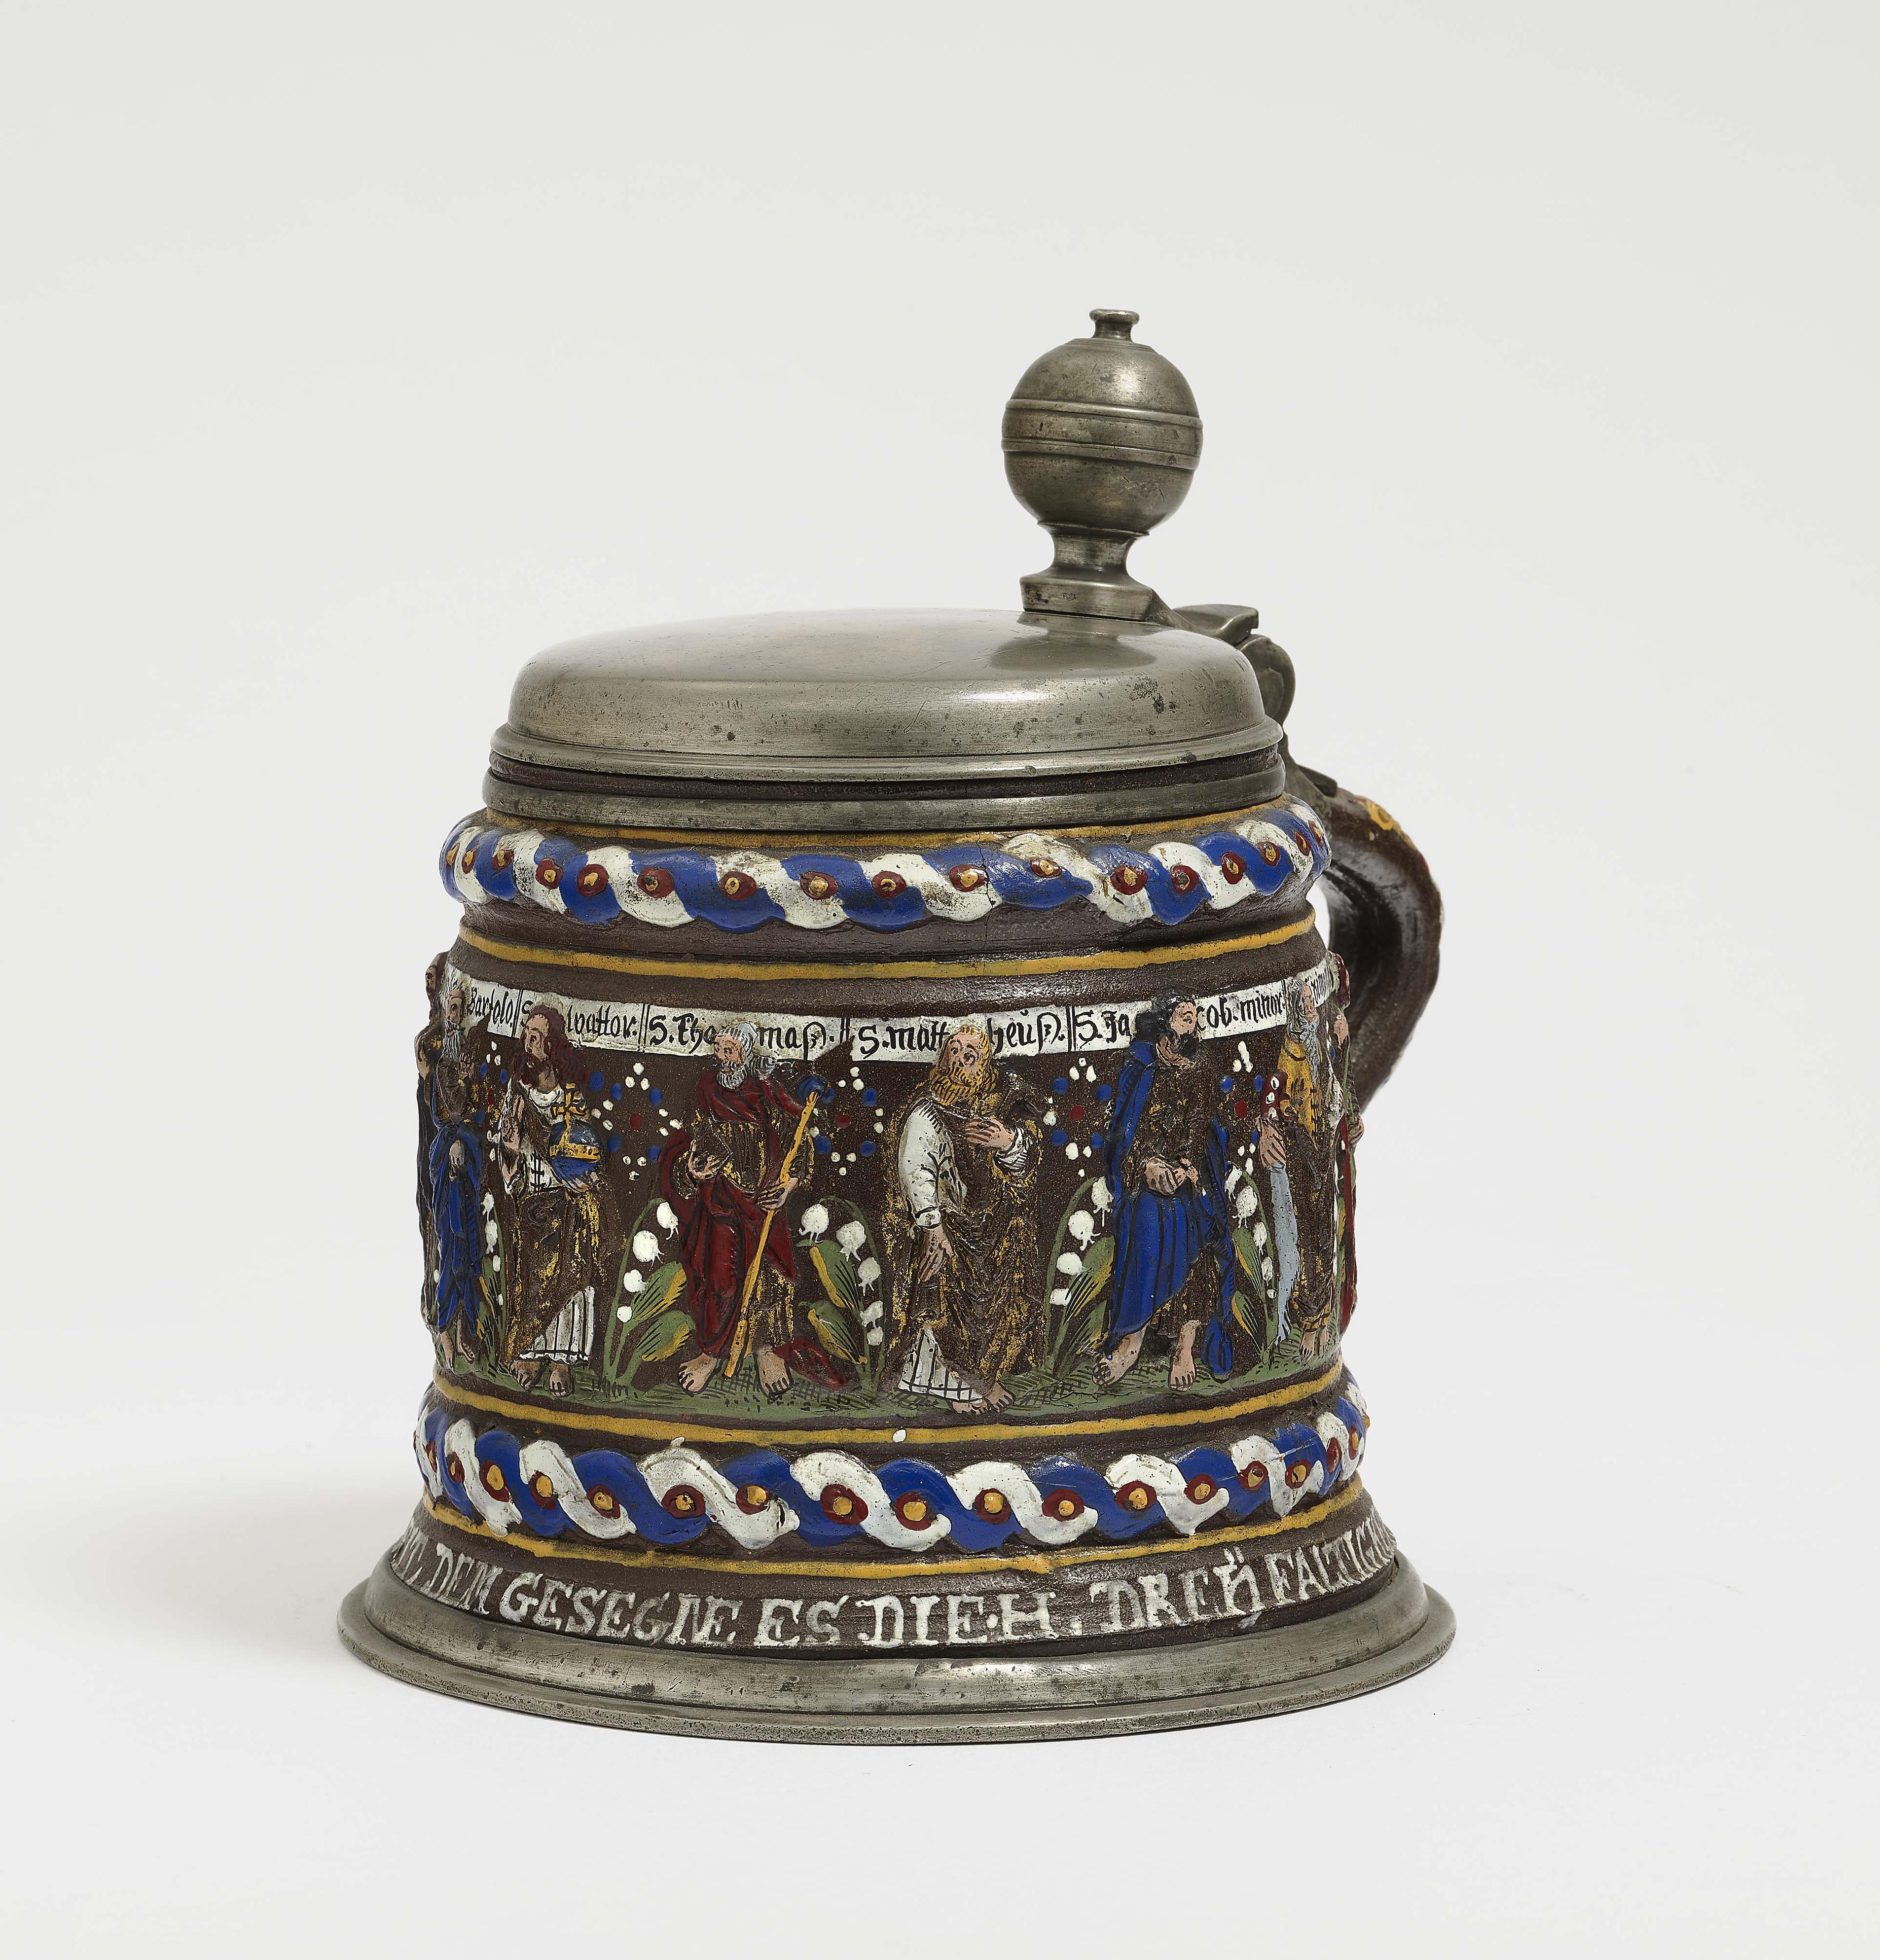 A Stoneware Tankard - Creussen-